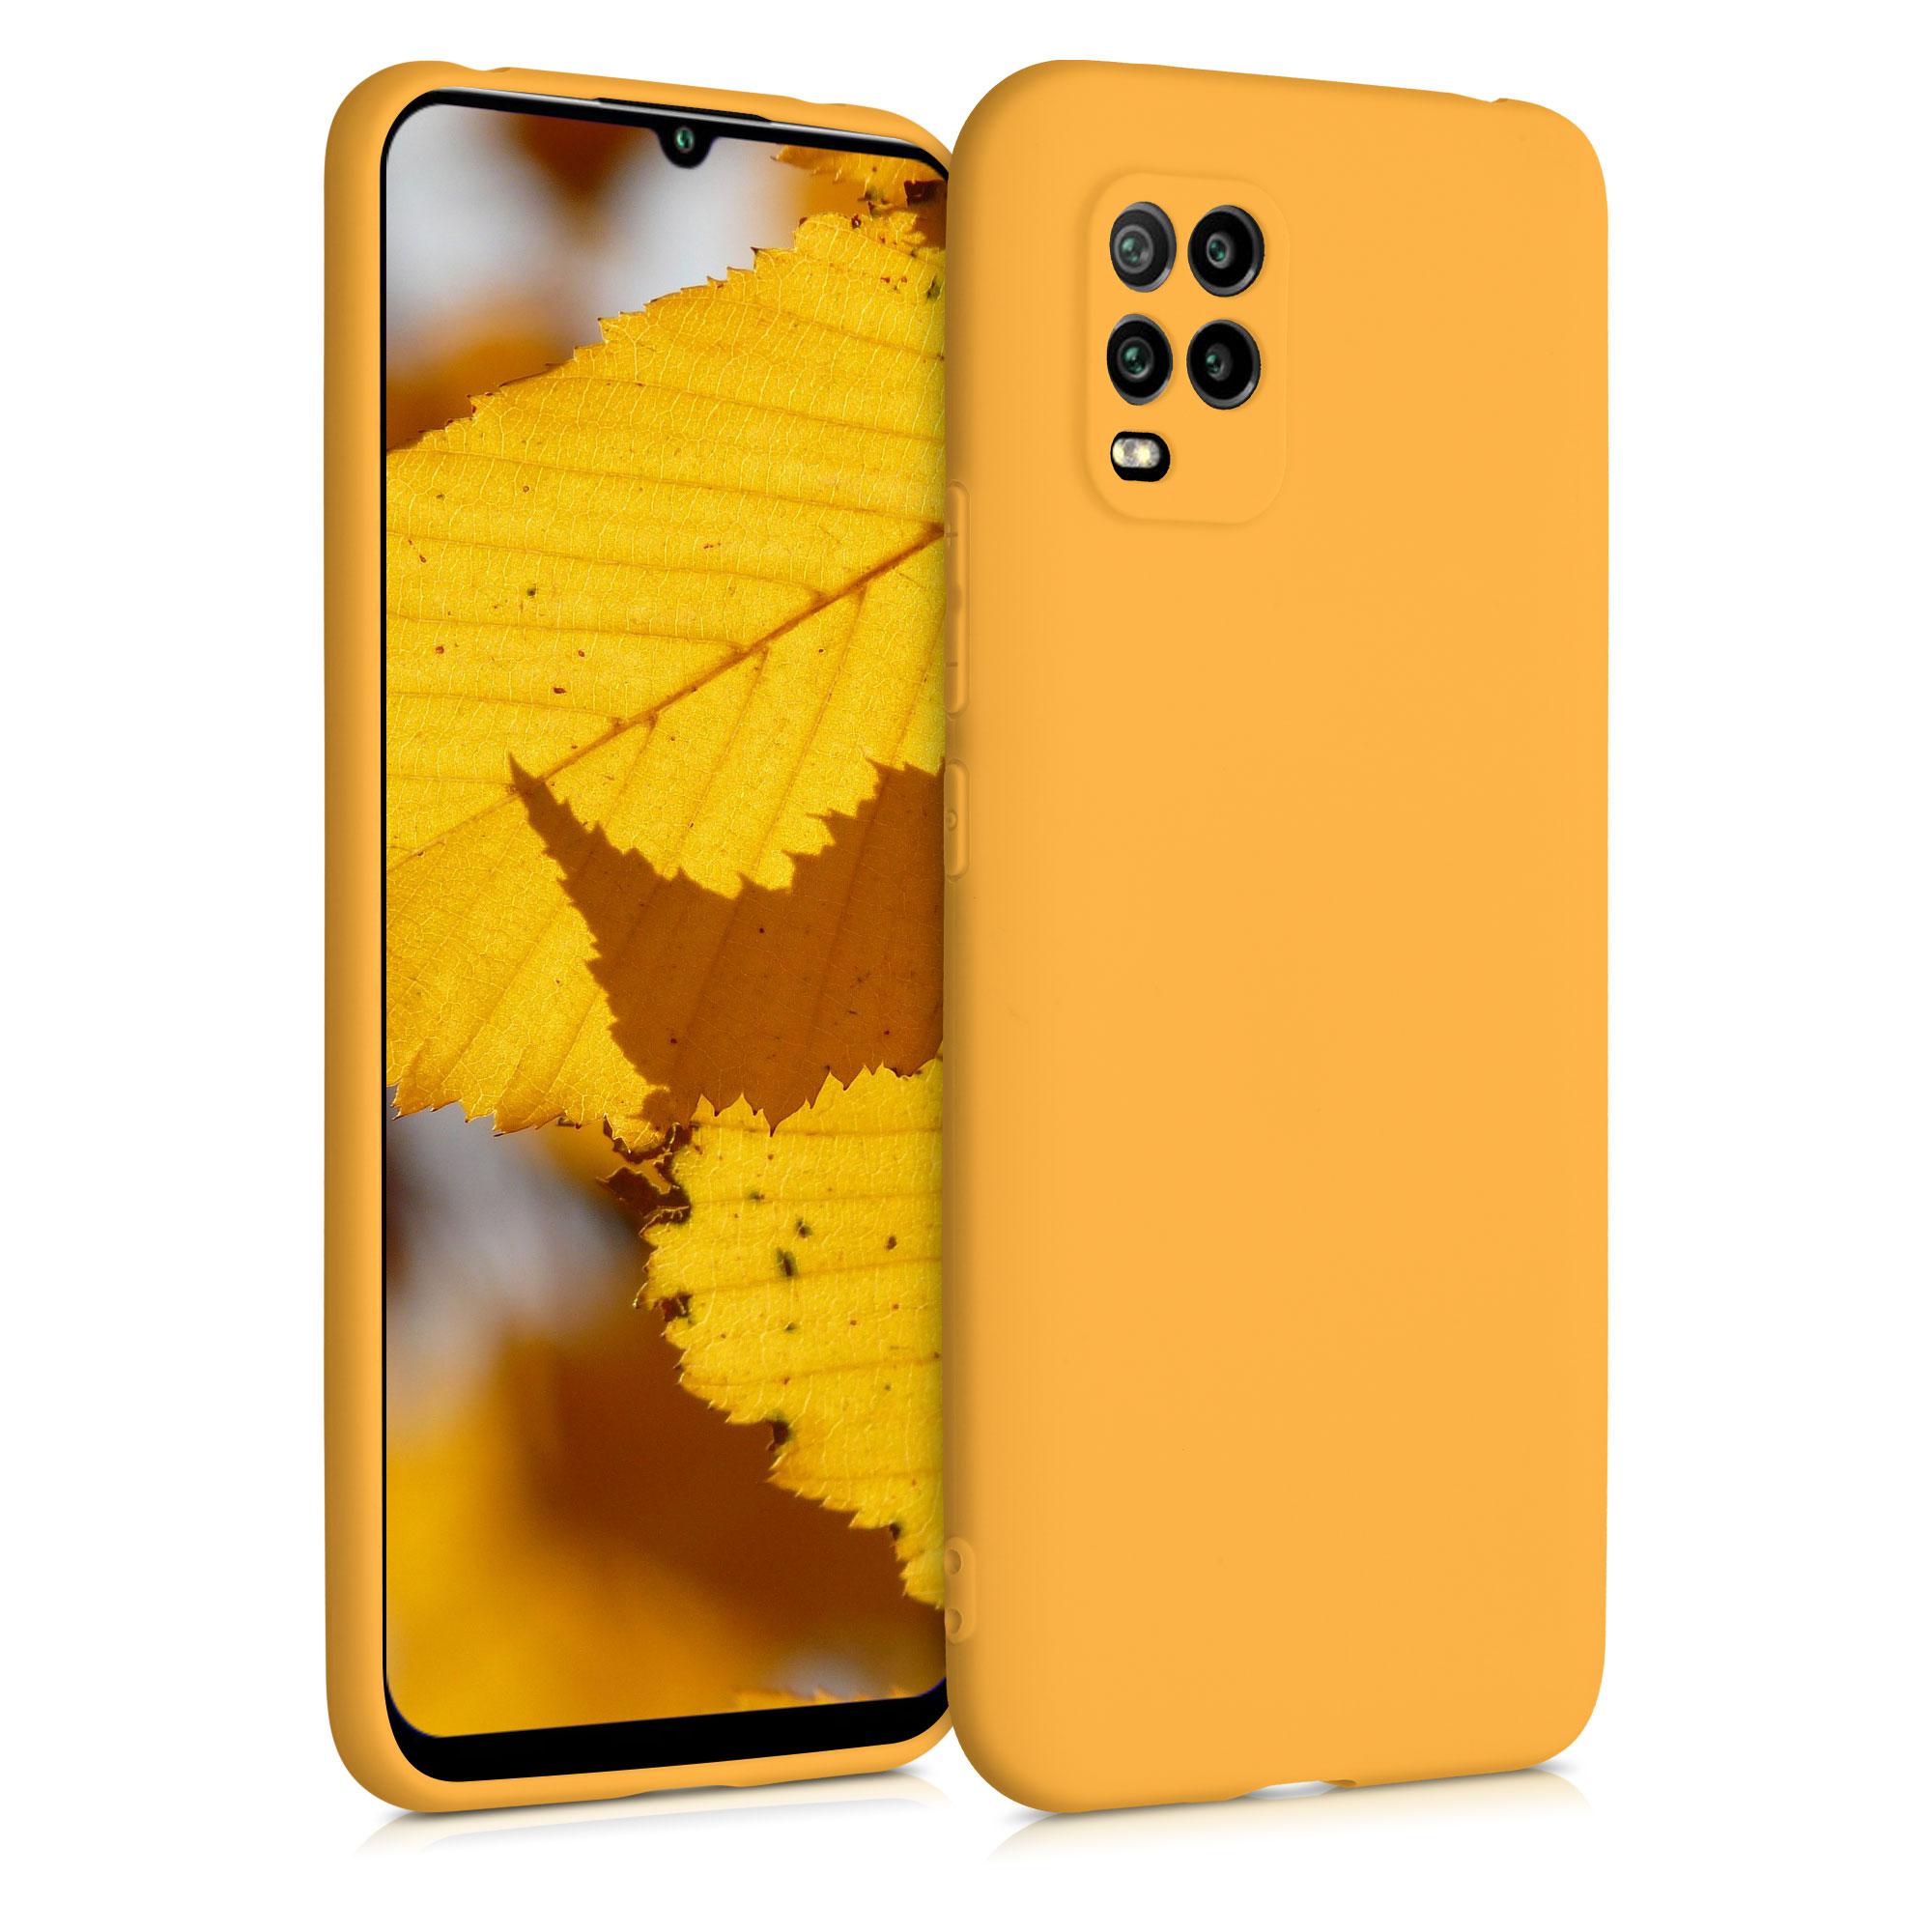 Tenké mango oranžové silikonové pouzdro / obal pro Xiaomi Mi 10 Lite